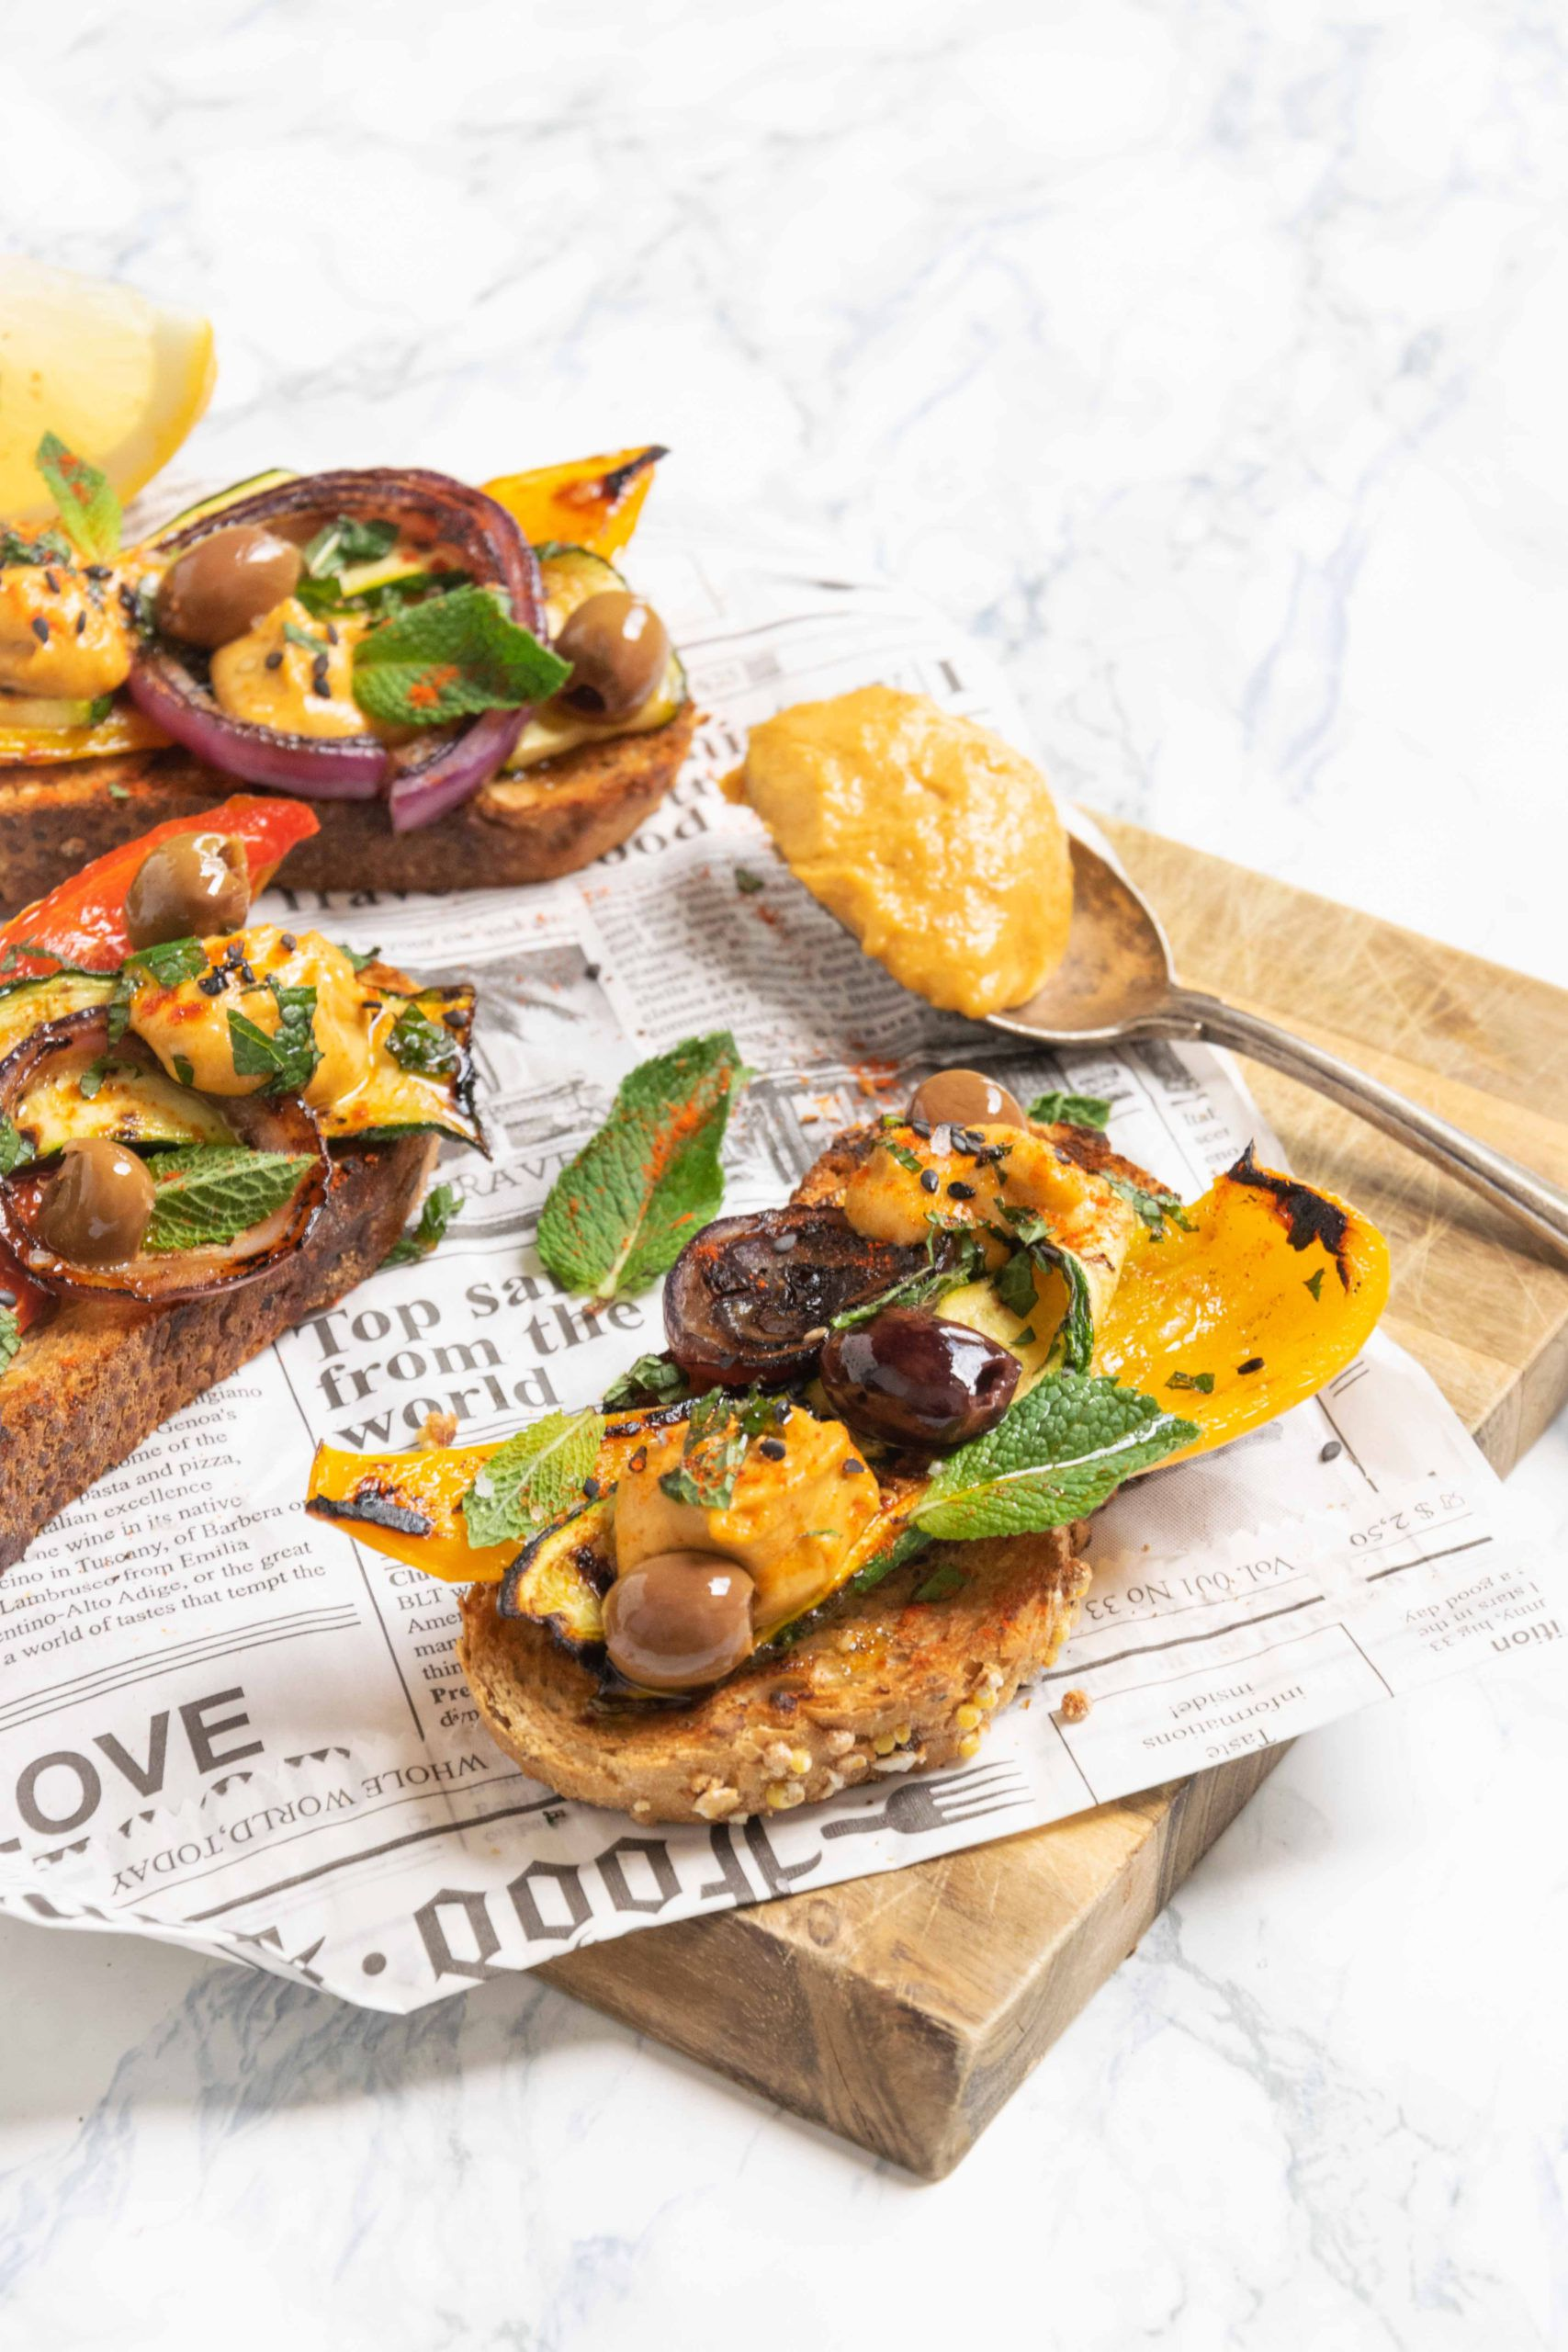 Bruschette con verdure, olive e tahina